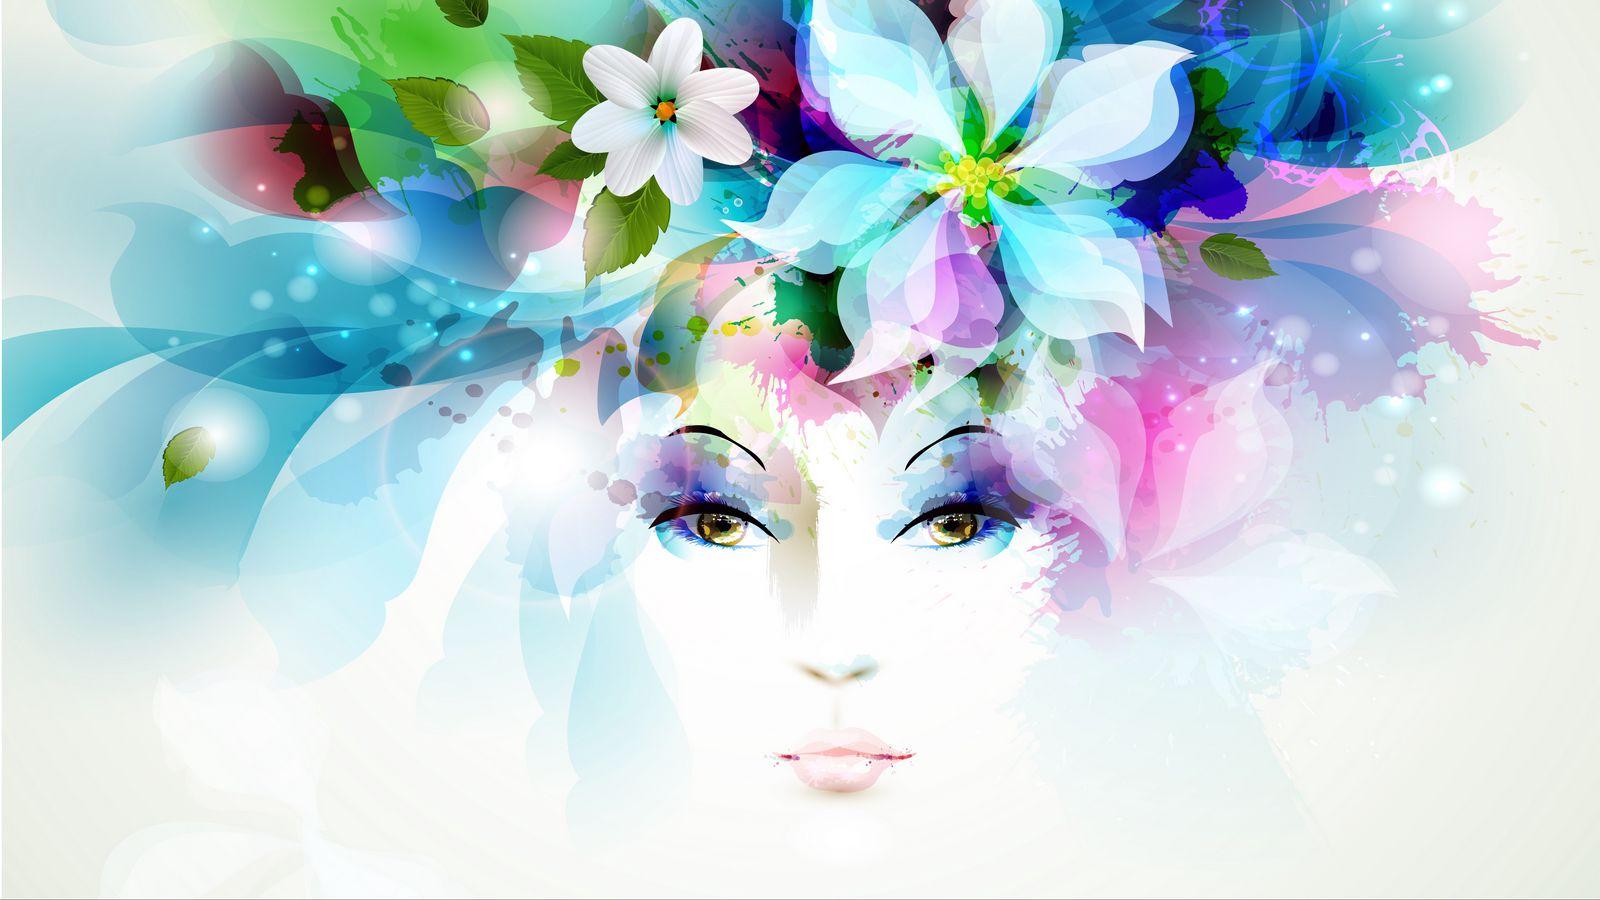 1600x900 Wallpaper art, girl, eyes, flowers, petals, butterfly, leaves, spray